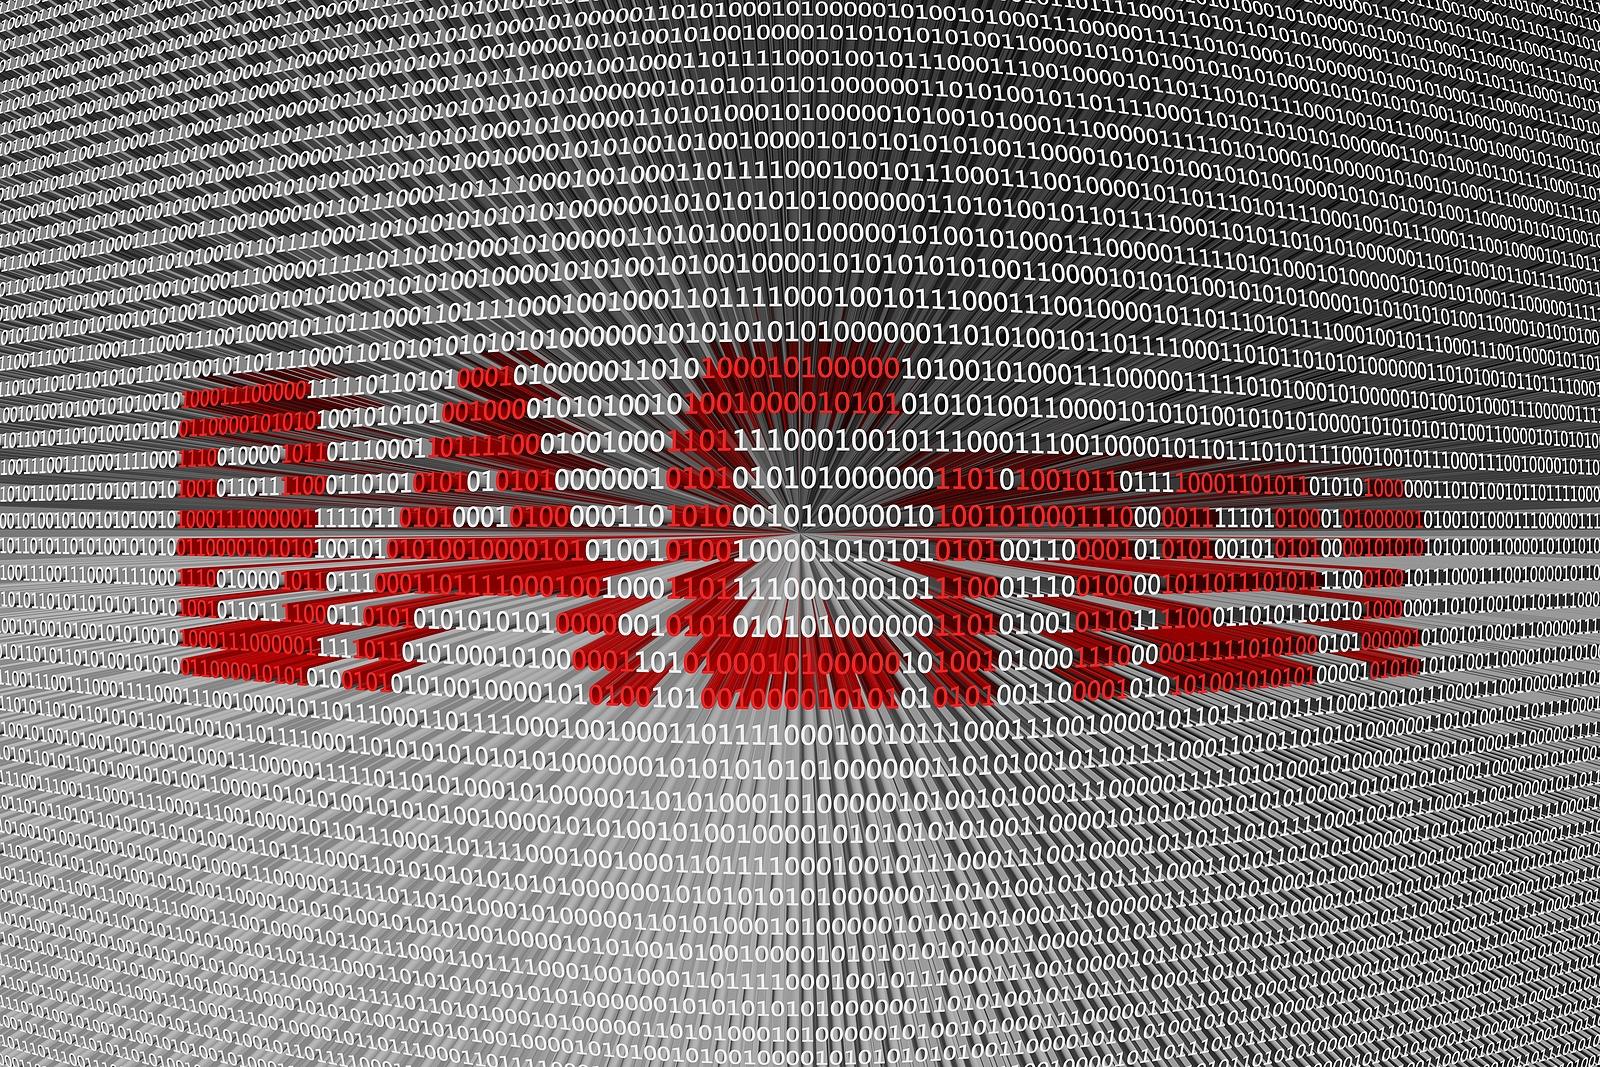 BACnet binary code representing an open BAS configuration